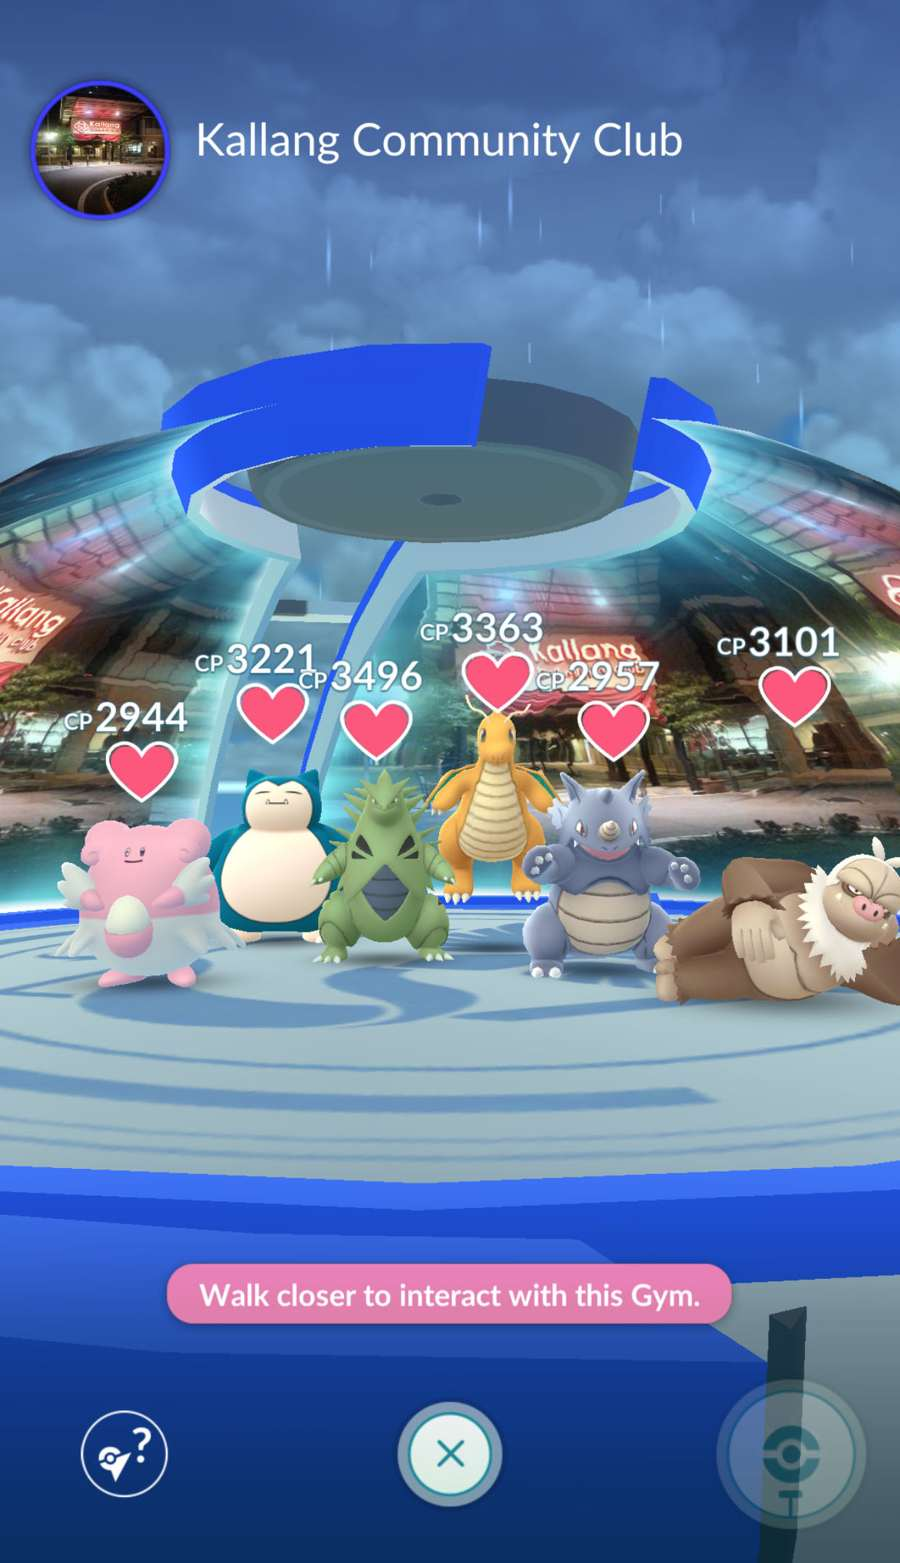 8 Reasons Why I'm Still A Hardcore Pokémon Go Trainer, Even